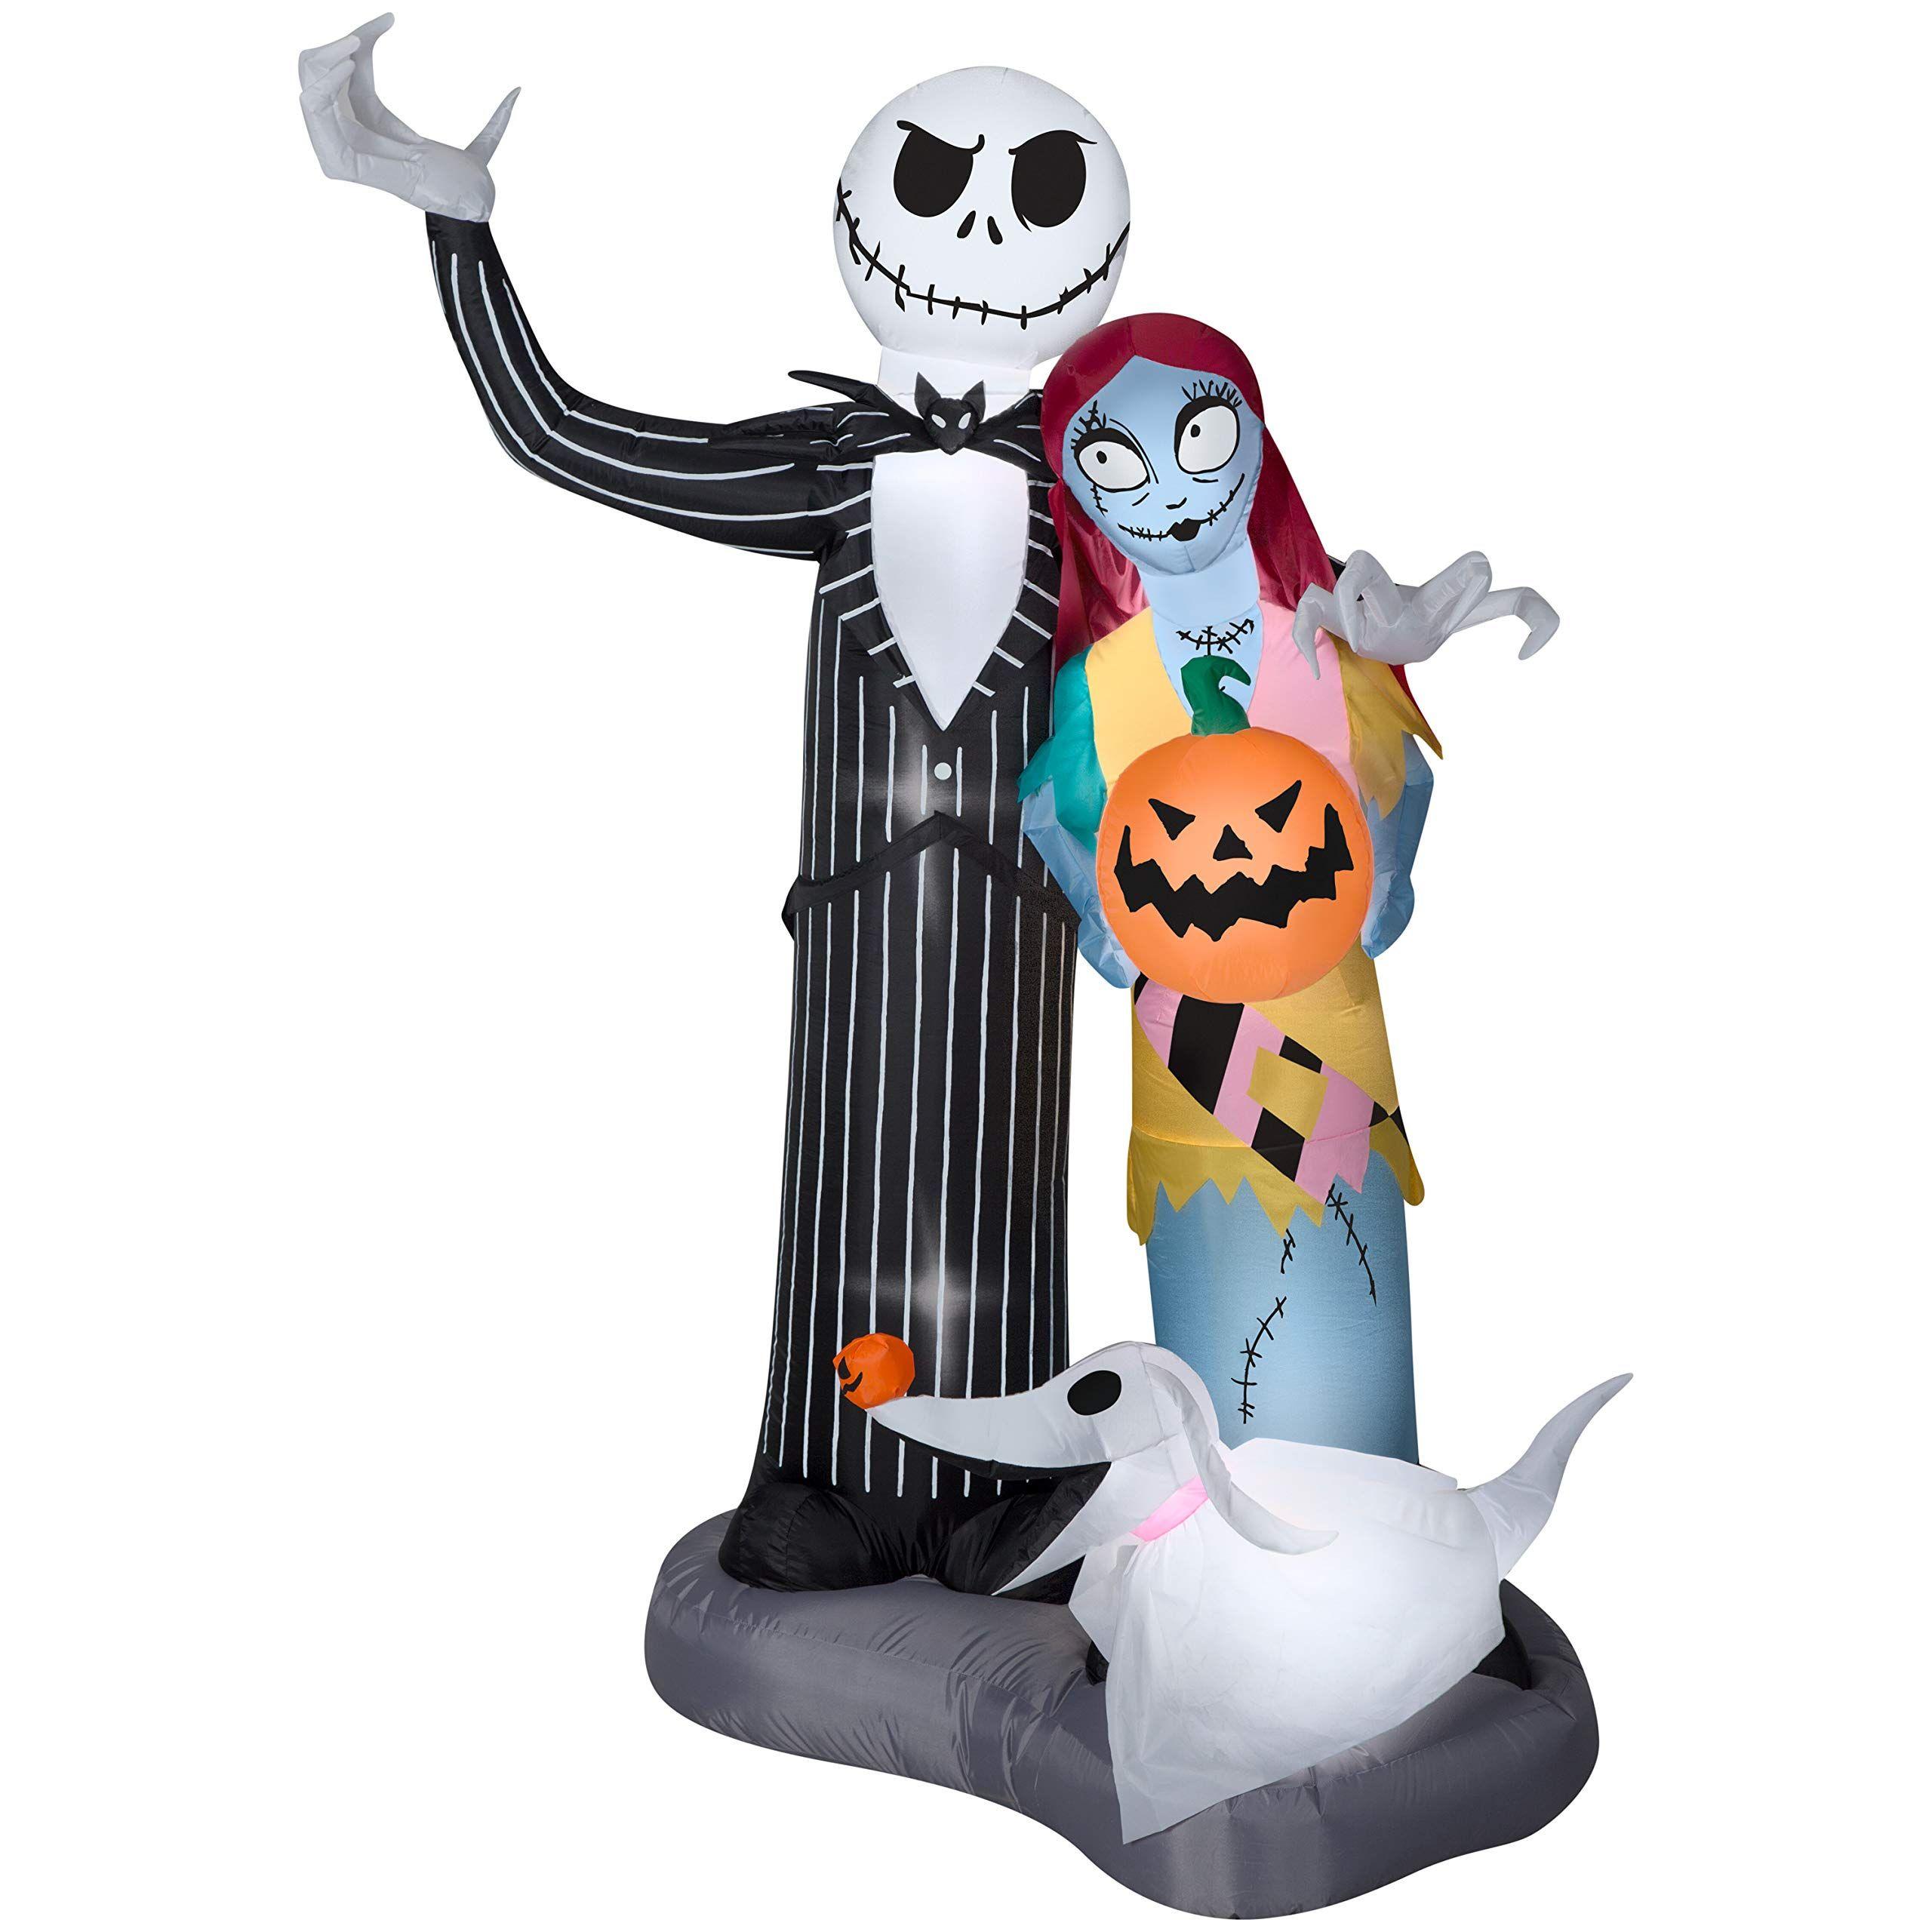 Airblown Inflatable Halloween Jack Skellington Nightmare